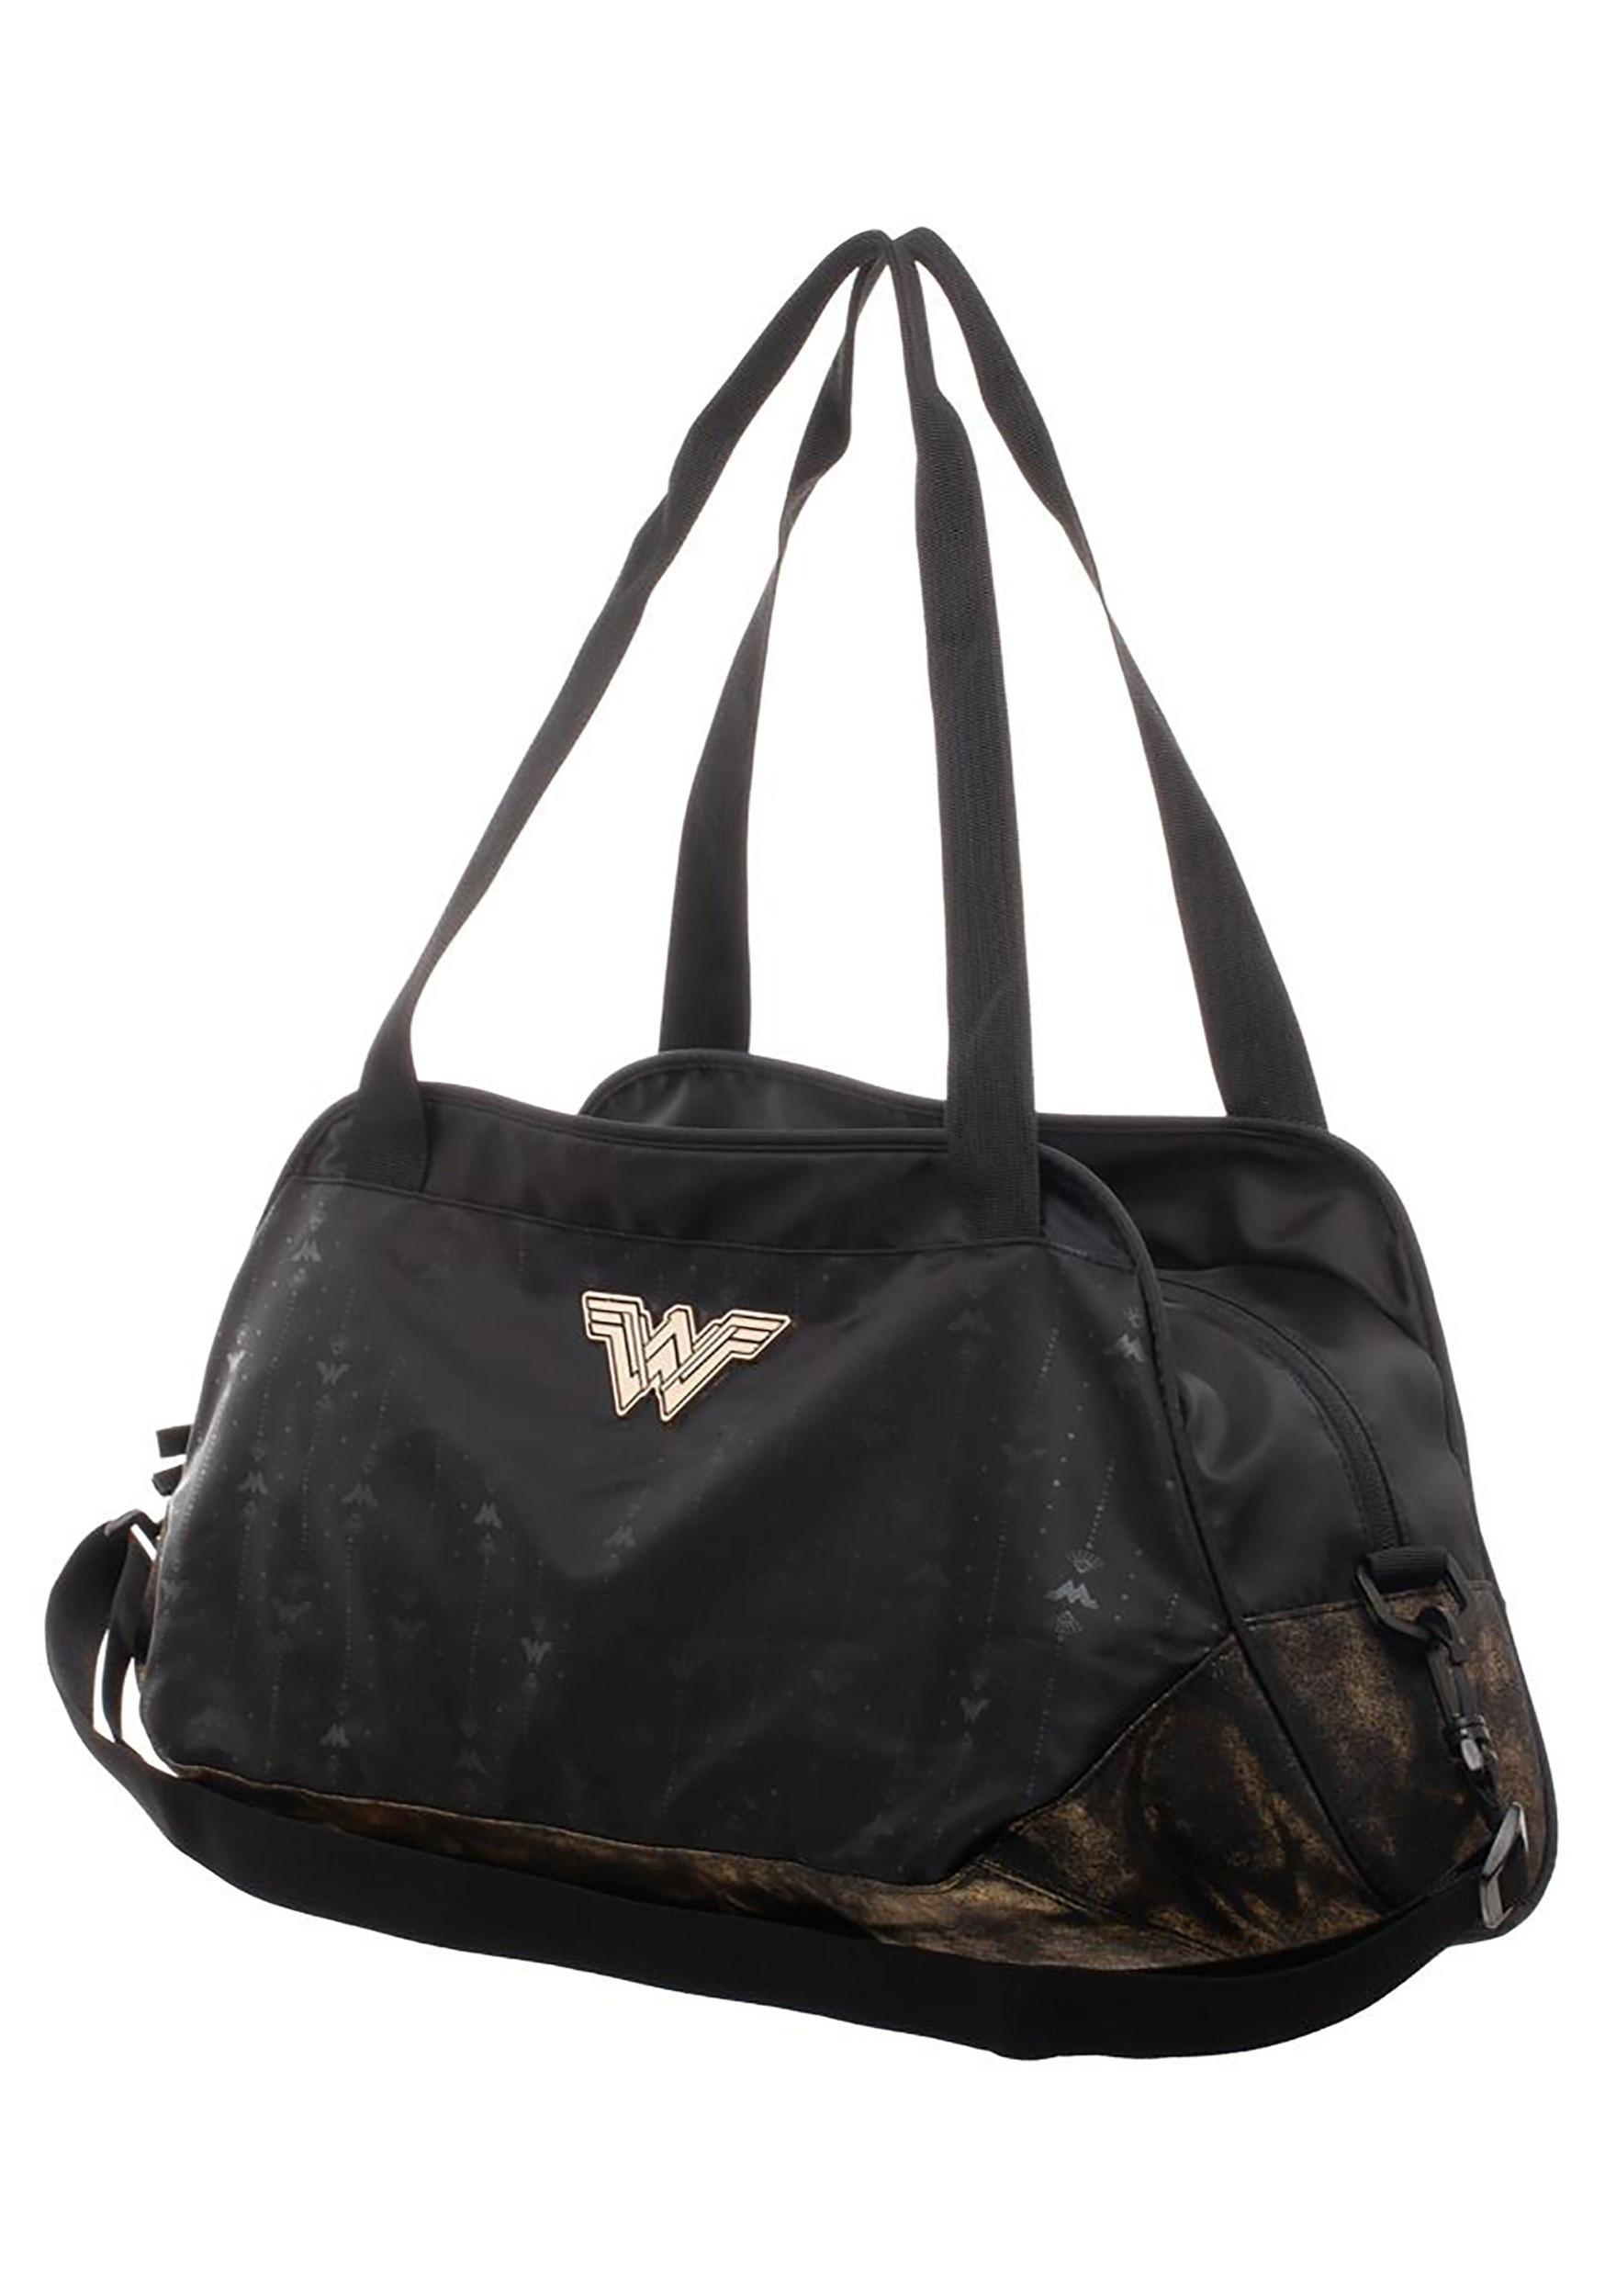 Wonder Woman Black Athletic Duffle Bag